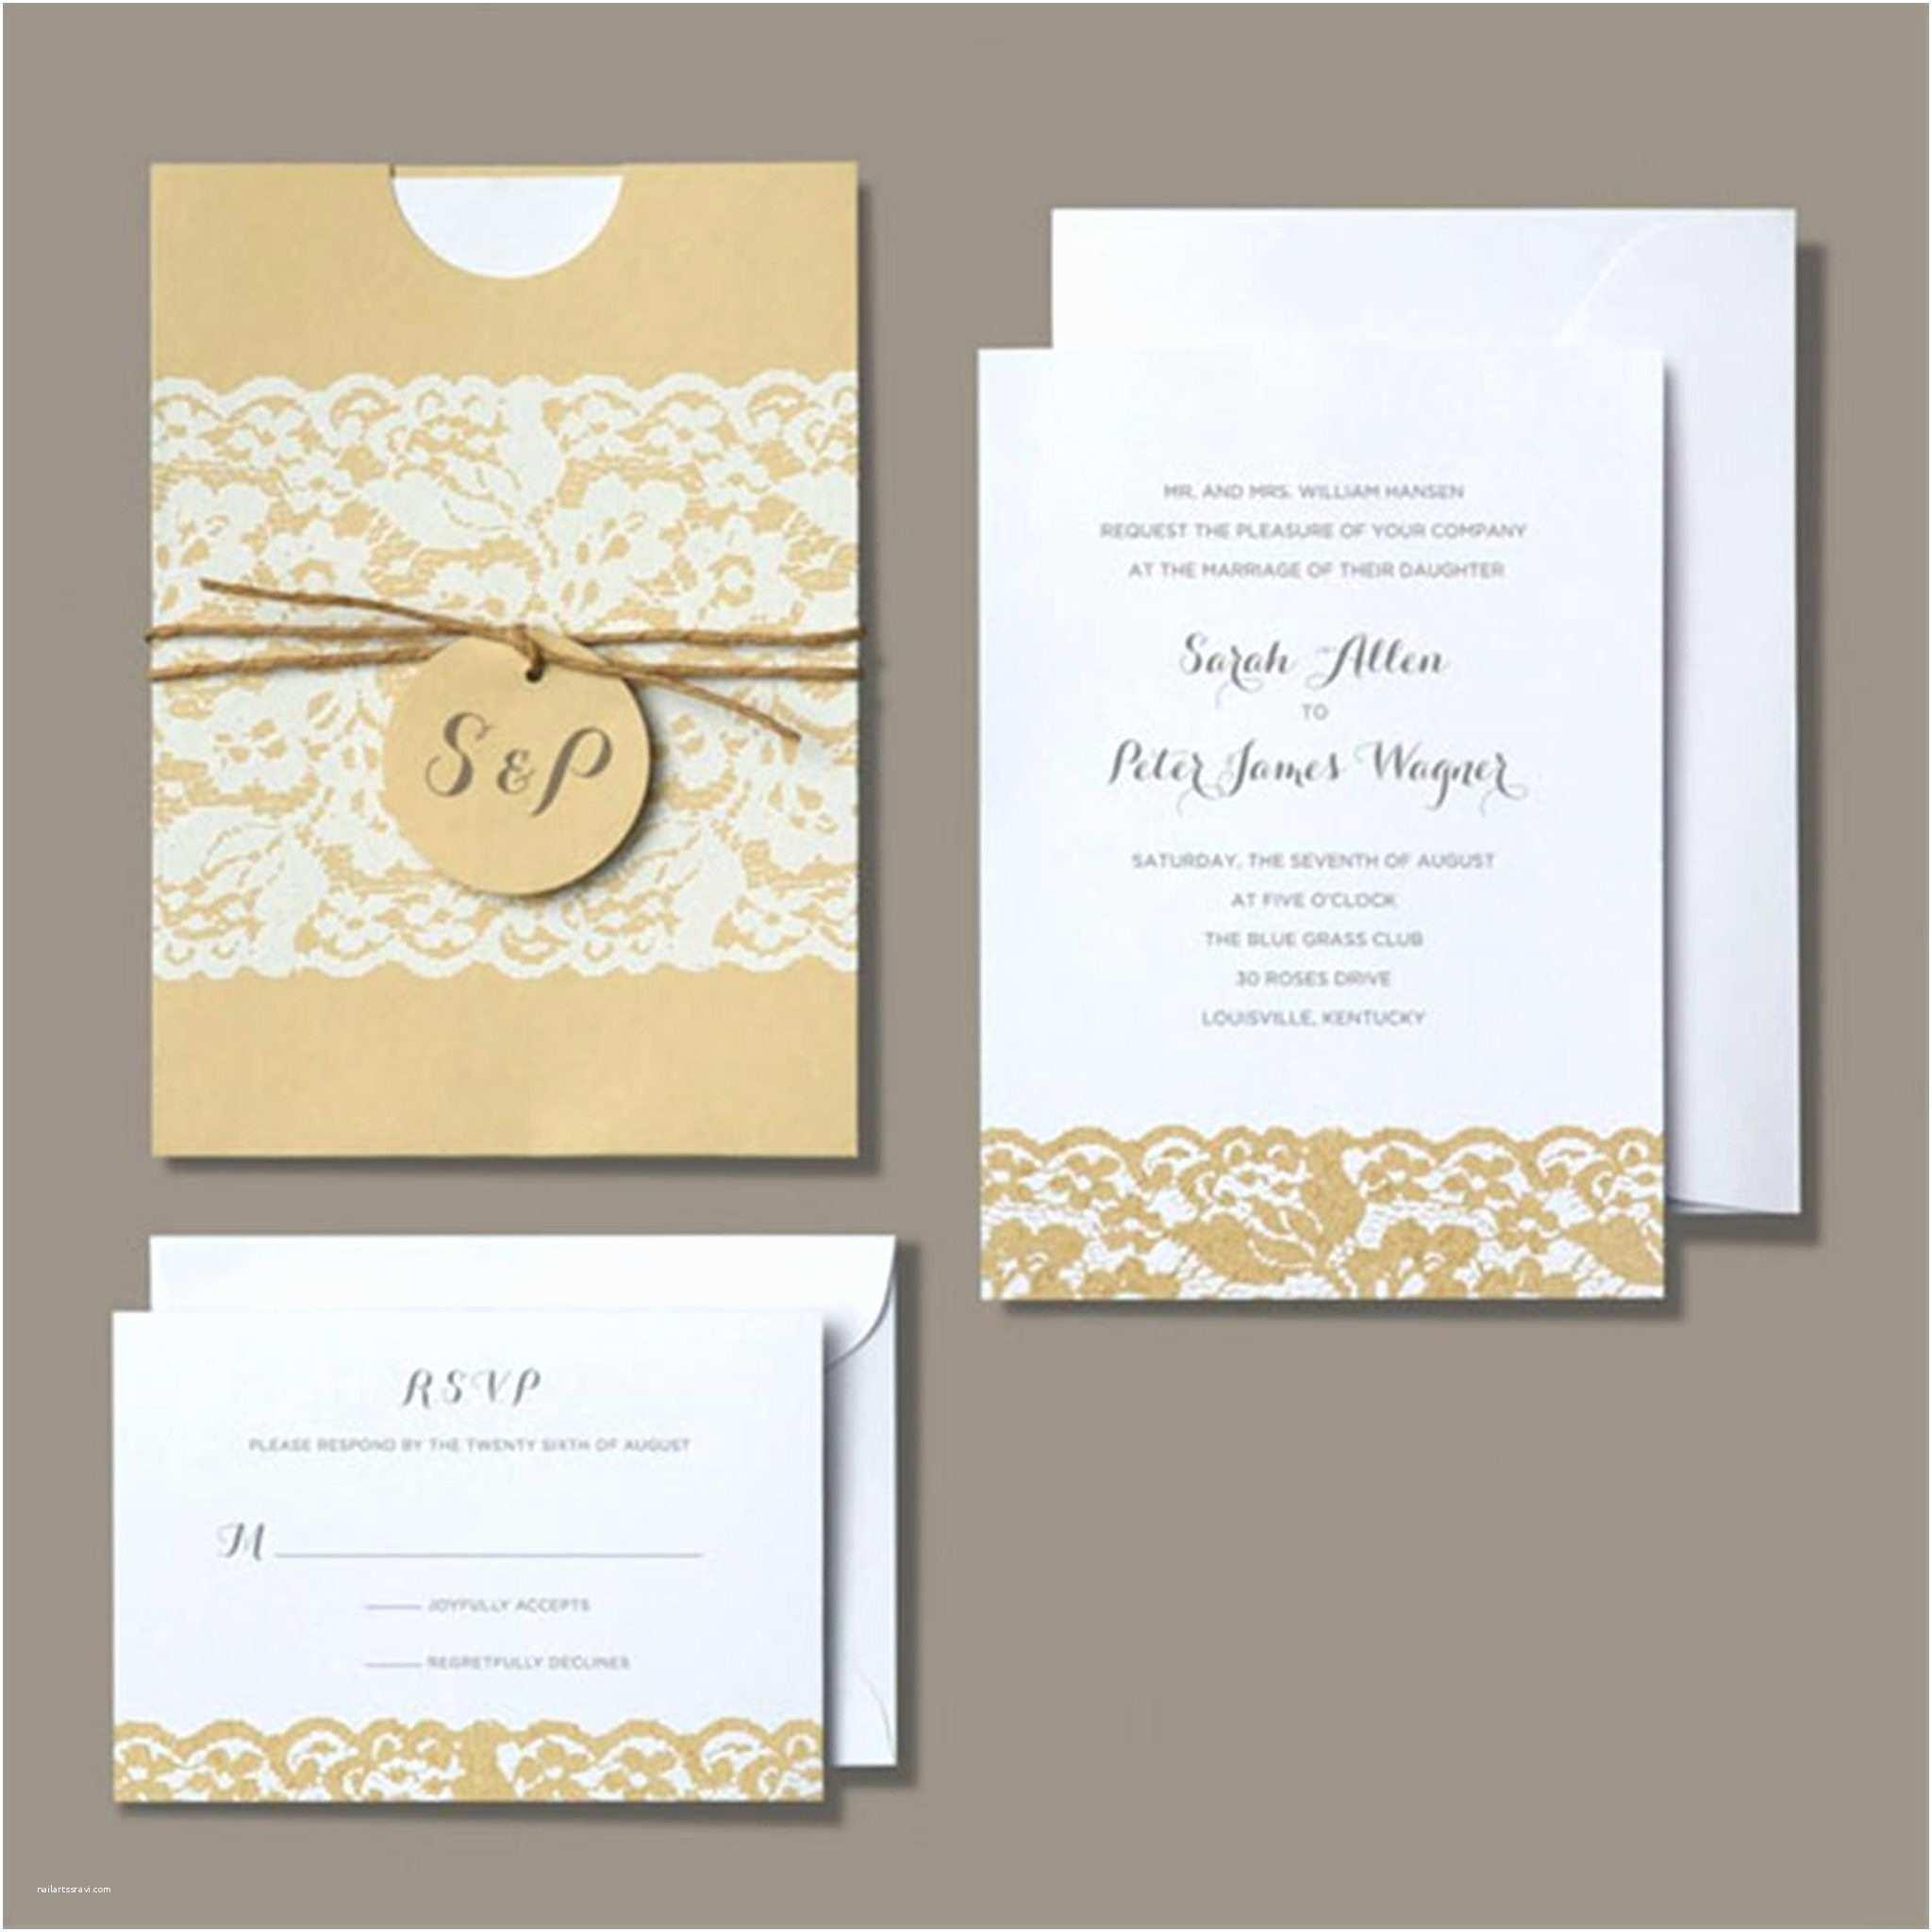 Brides Wedding Invitations Templates Coed Bridal Shower Invitation Wording as Well